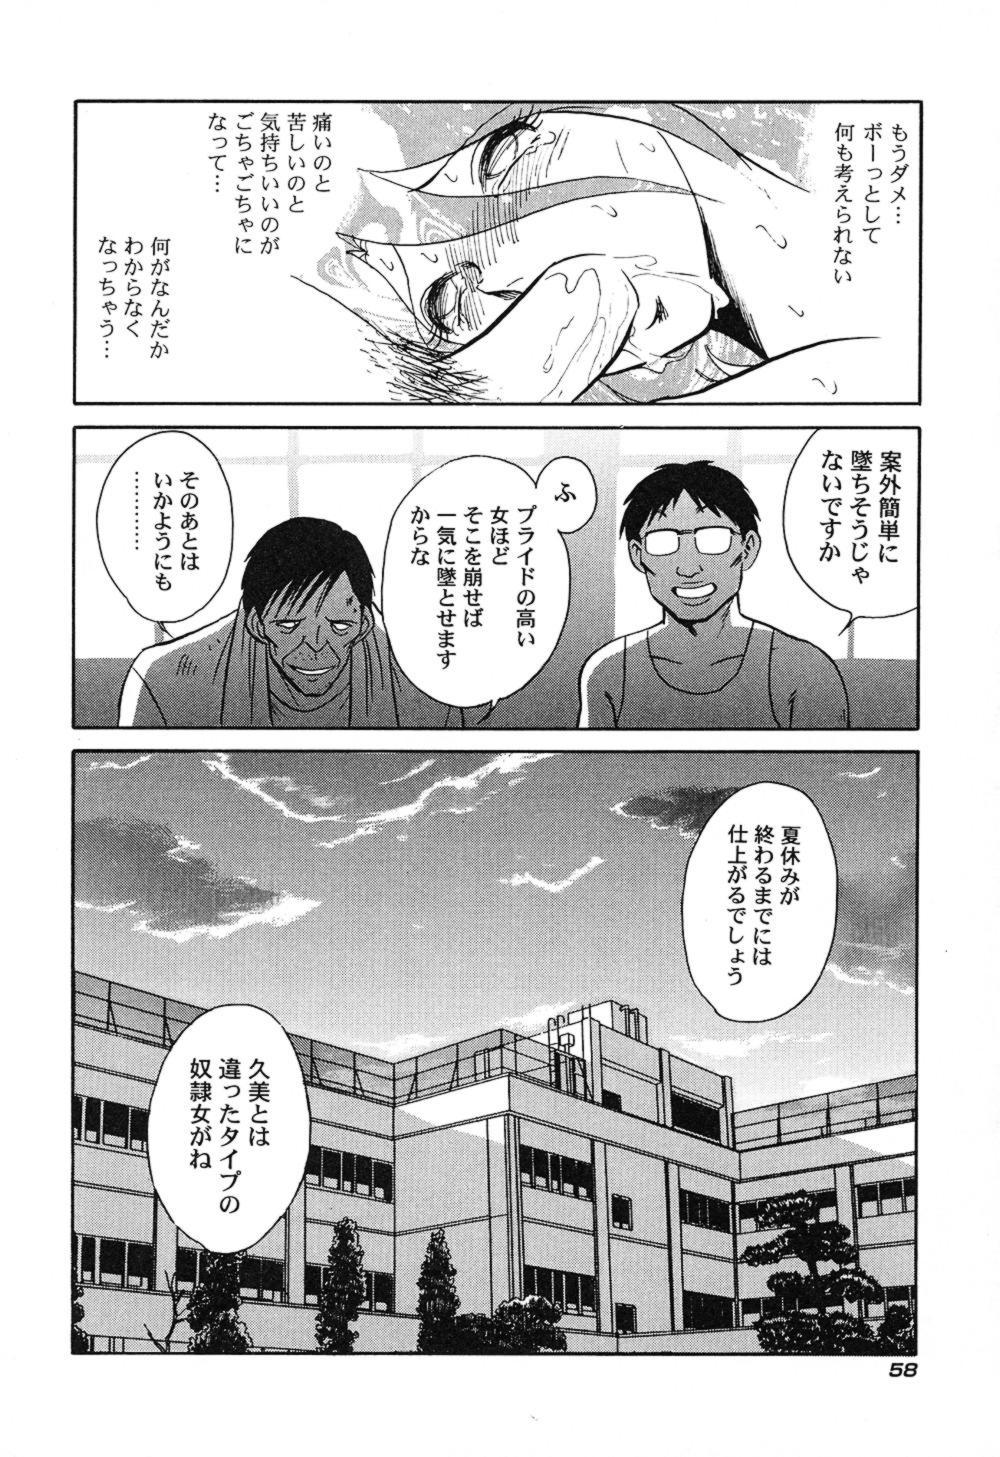 Hageshii Kagai Jugyou 60